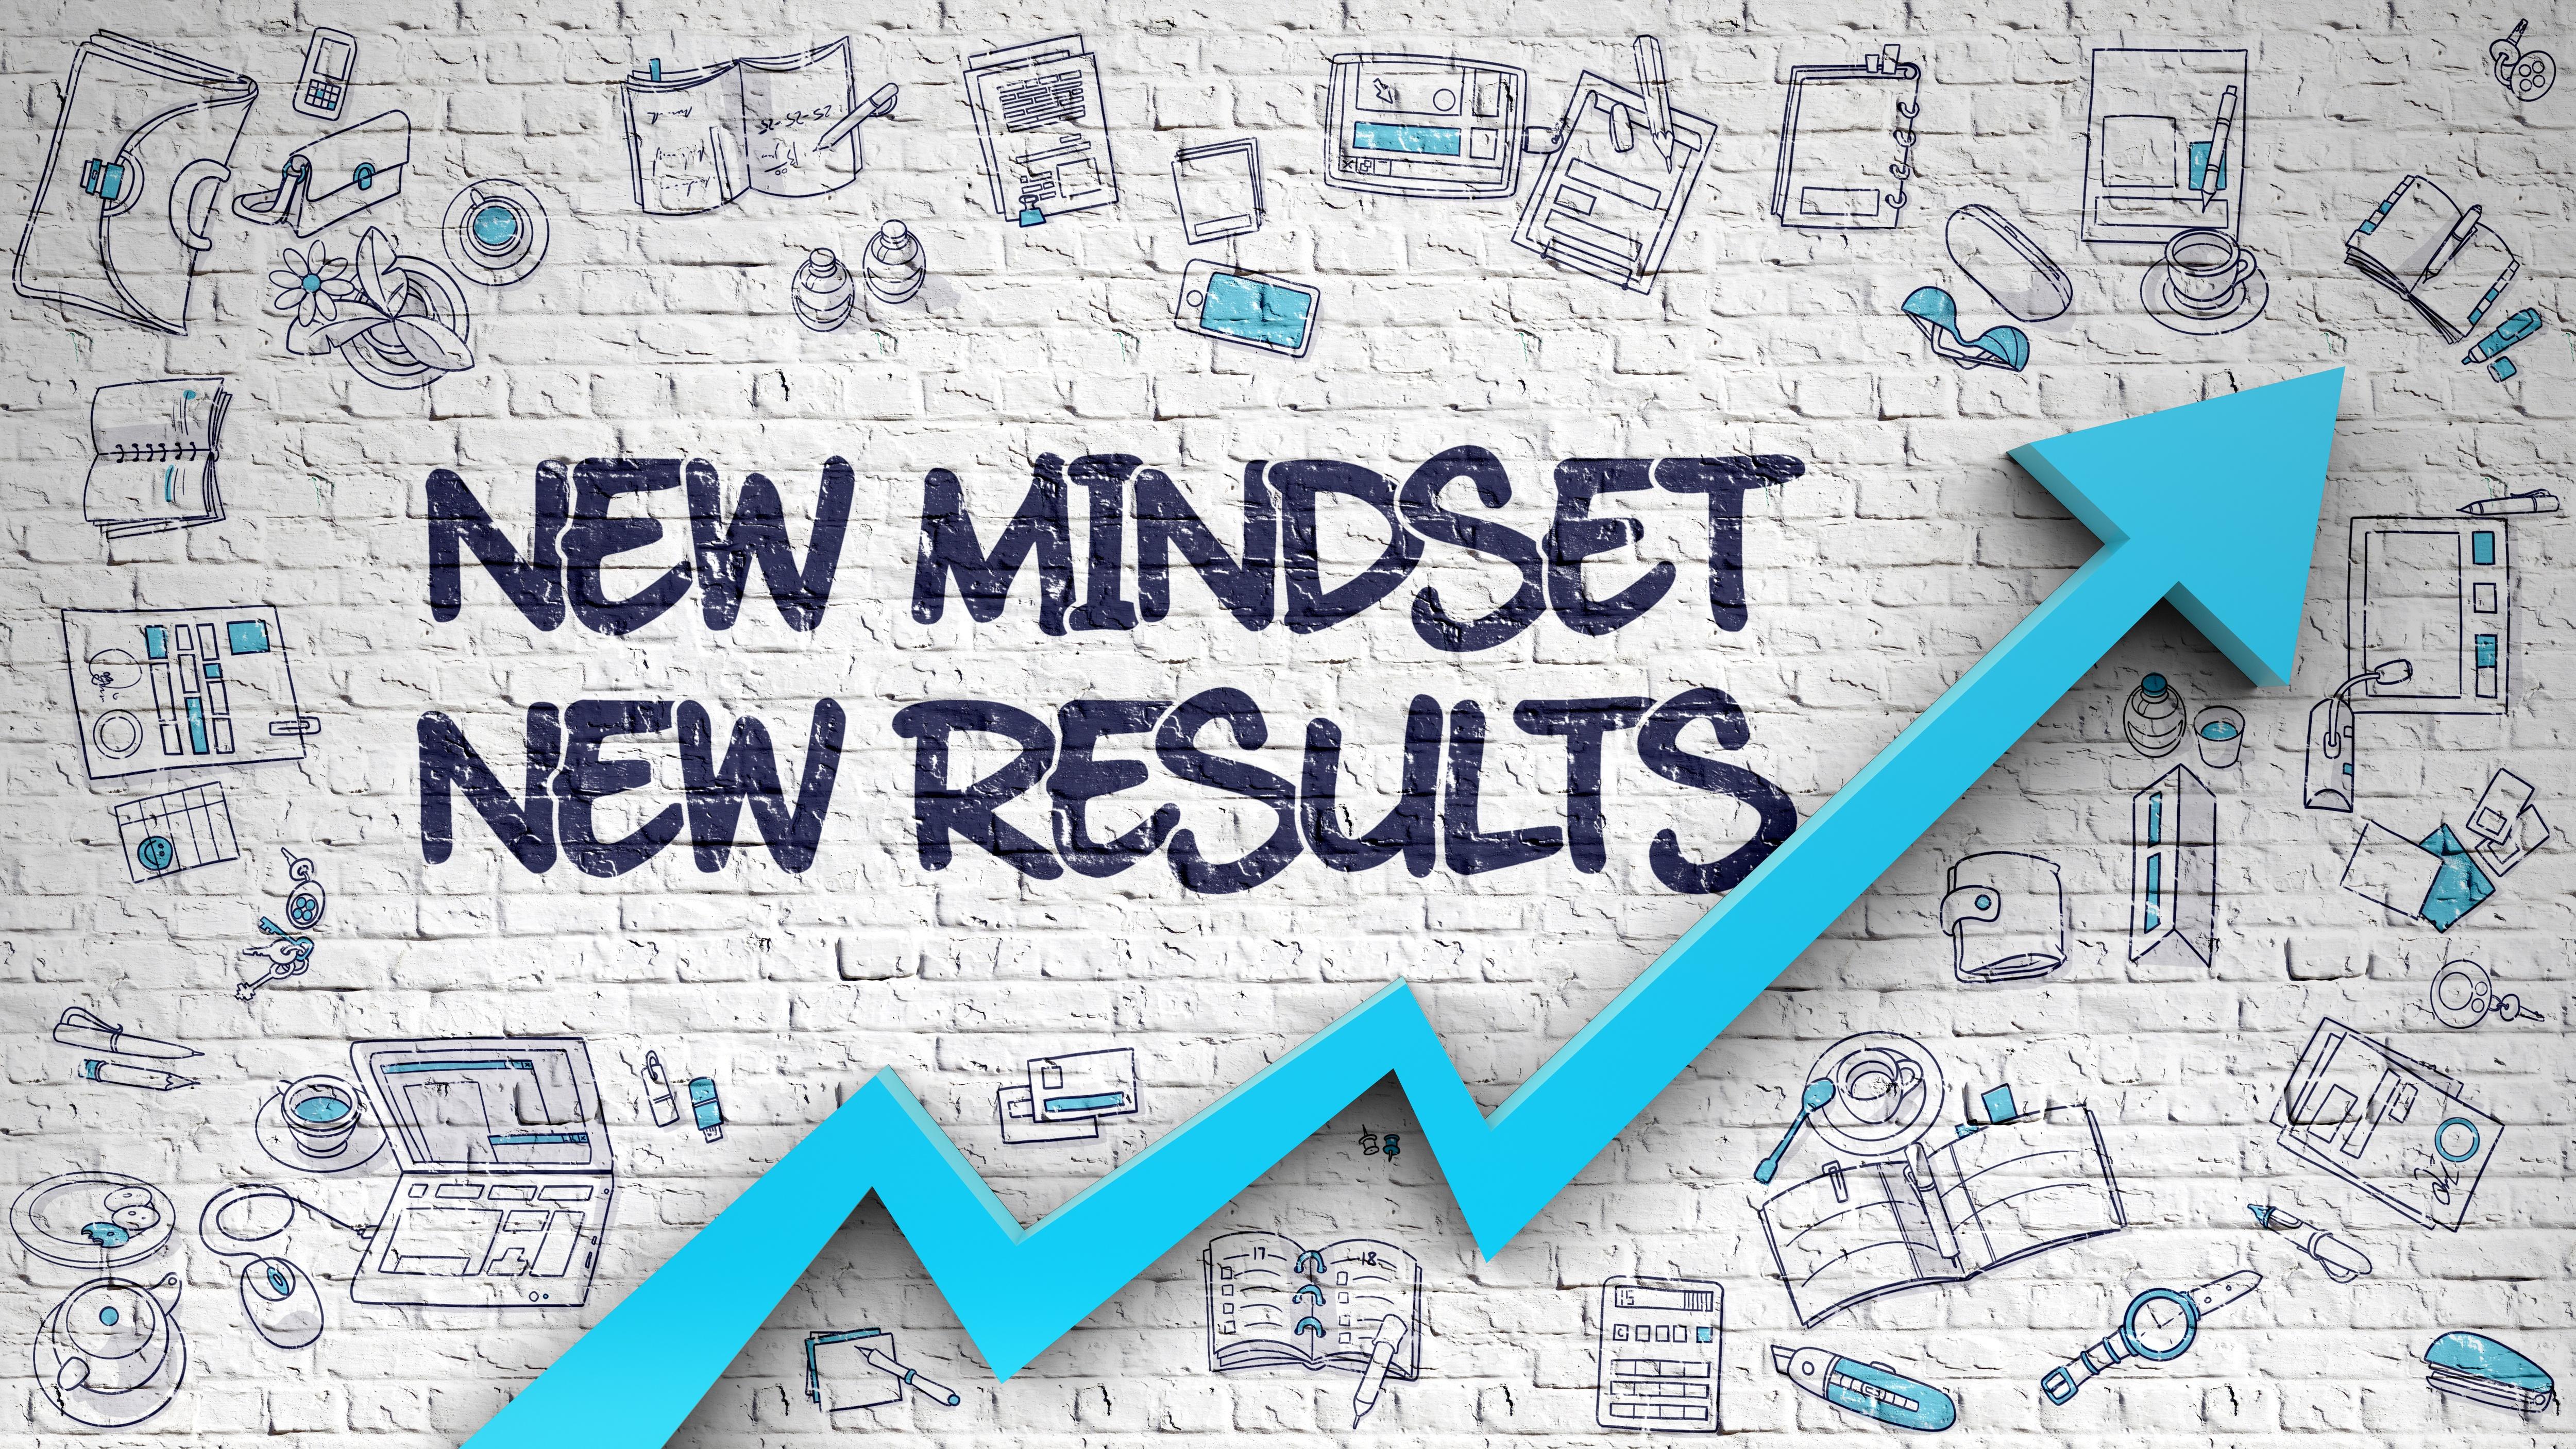 Shifting your QlikView application mindset to Qlik Sense